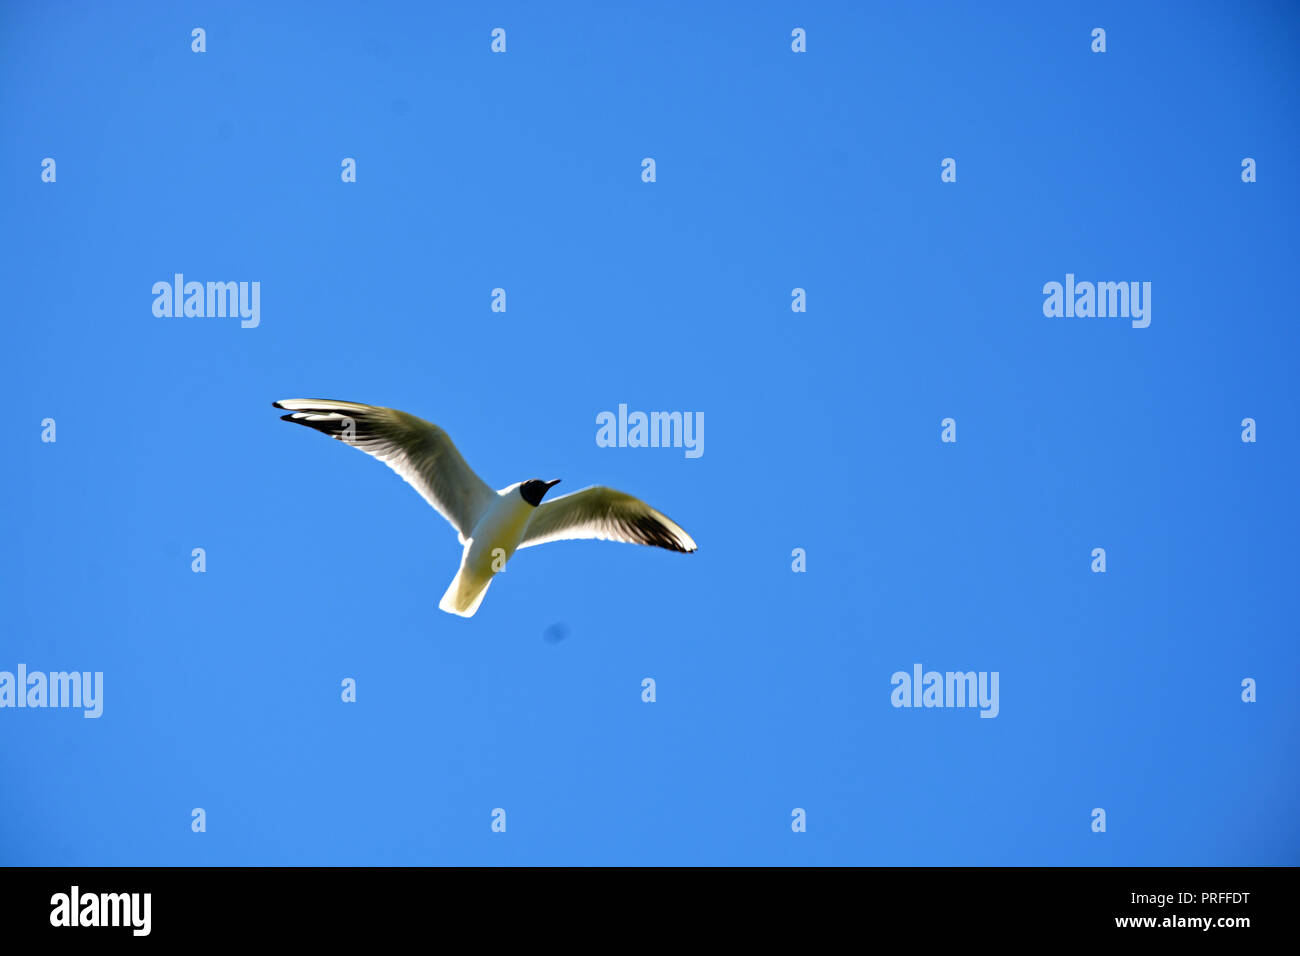 Möve  Himmel   Meer    Hintergrund - Stock Image